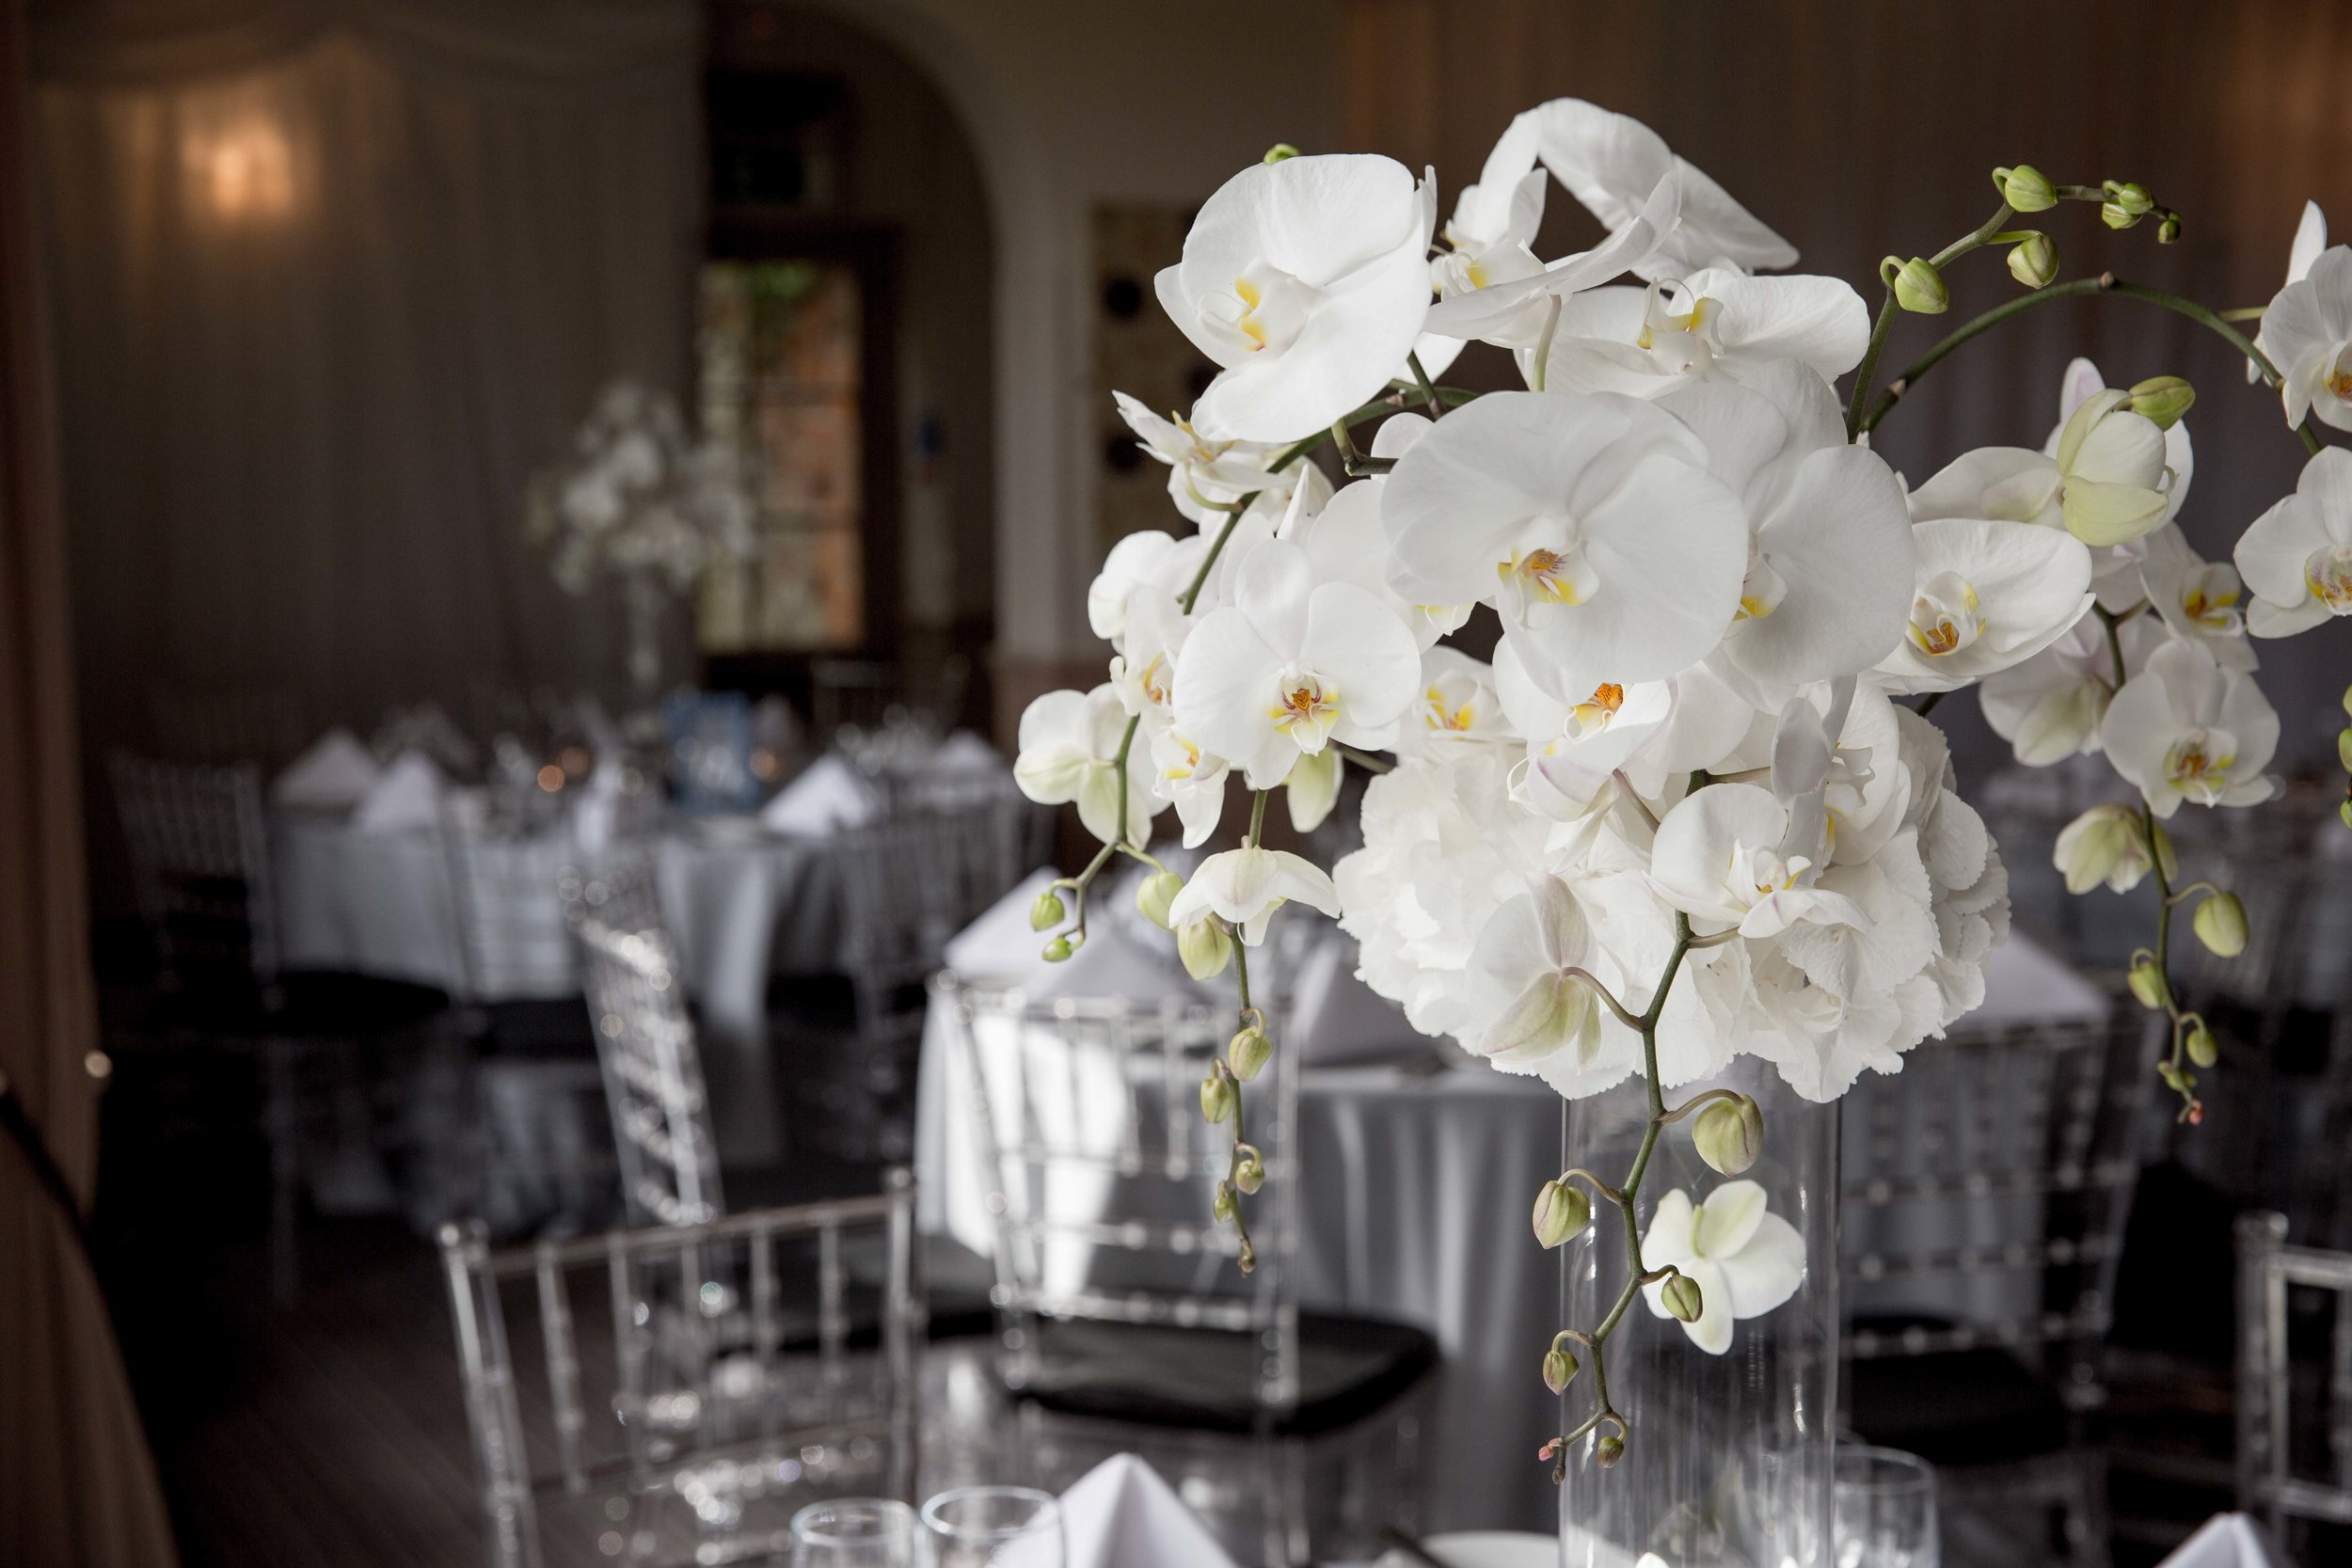 cotswold-wedding-photography-at-stonehouse-court-hotel-natalia-smith-photography-gloucestershire-wedding-photographer-70.jpg